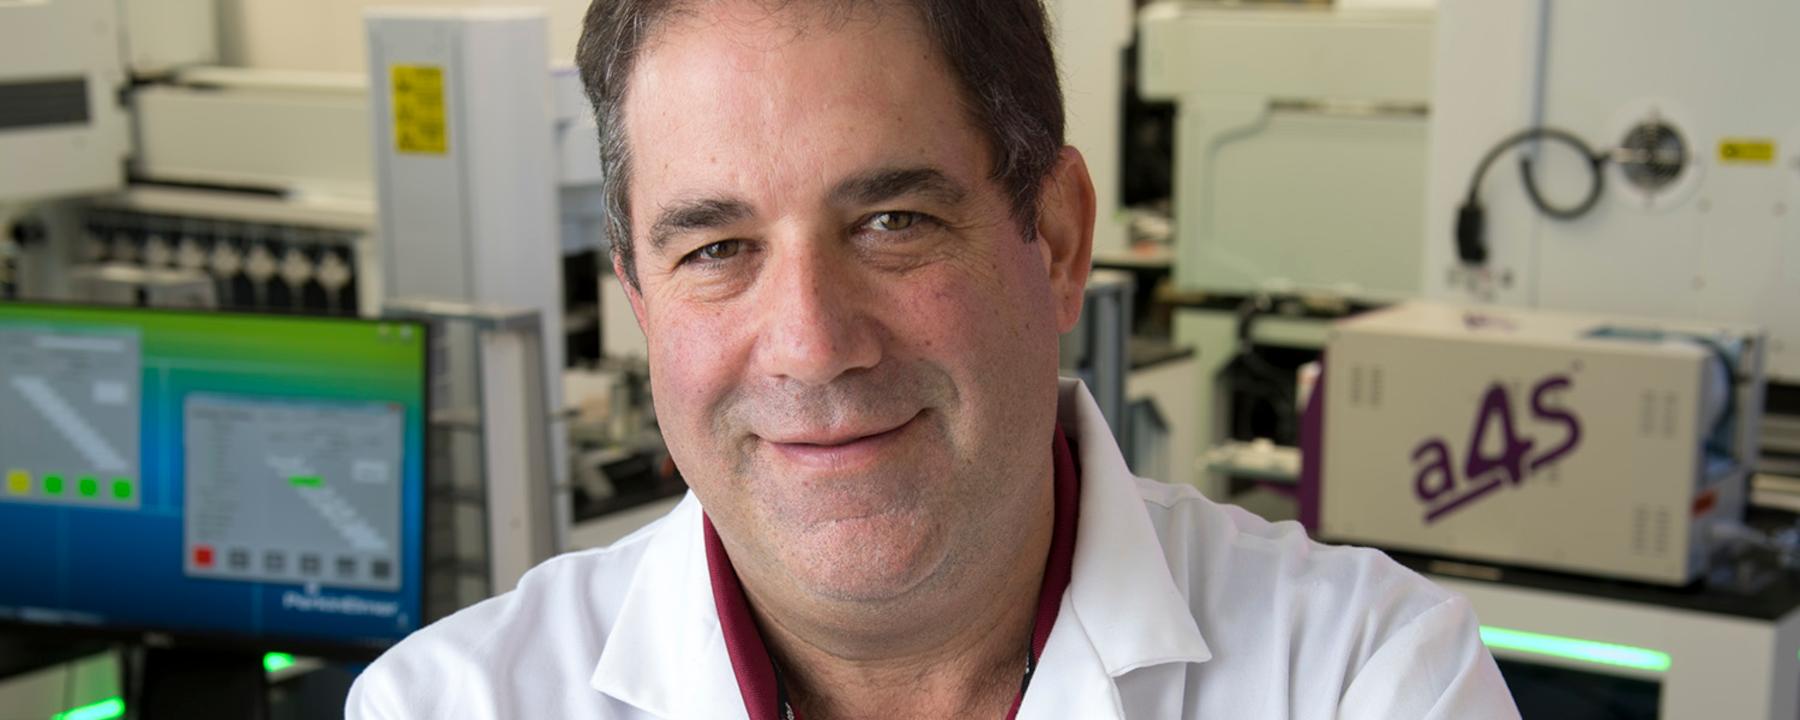 Andrew Brooks, Designer of COVID-19 Saliva Test, Dies at 51